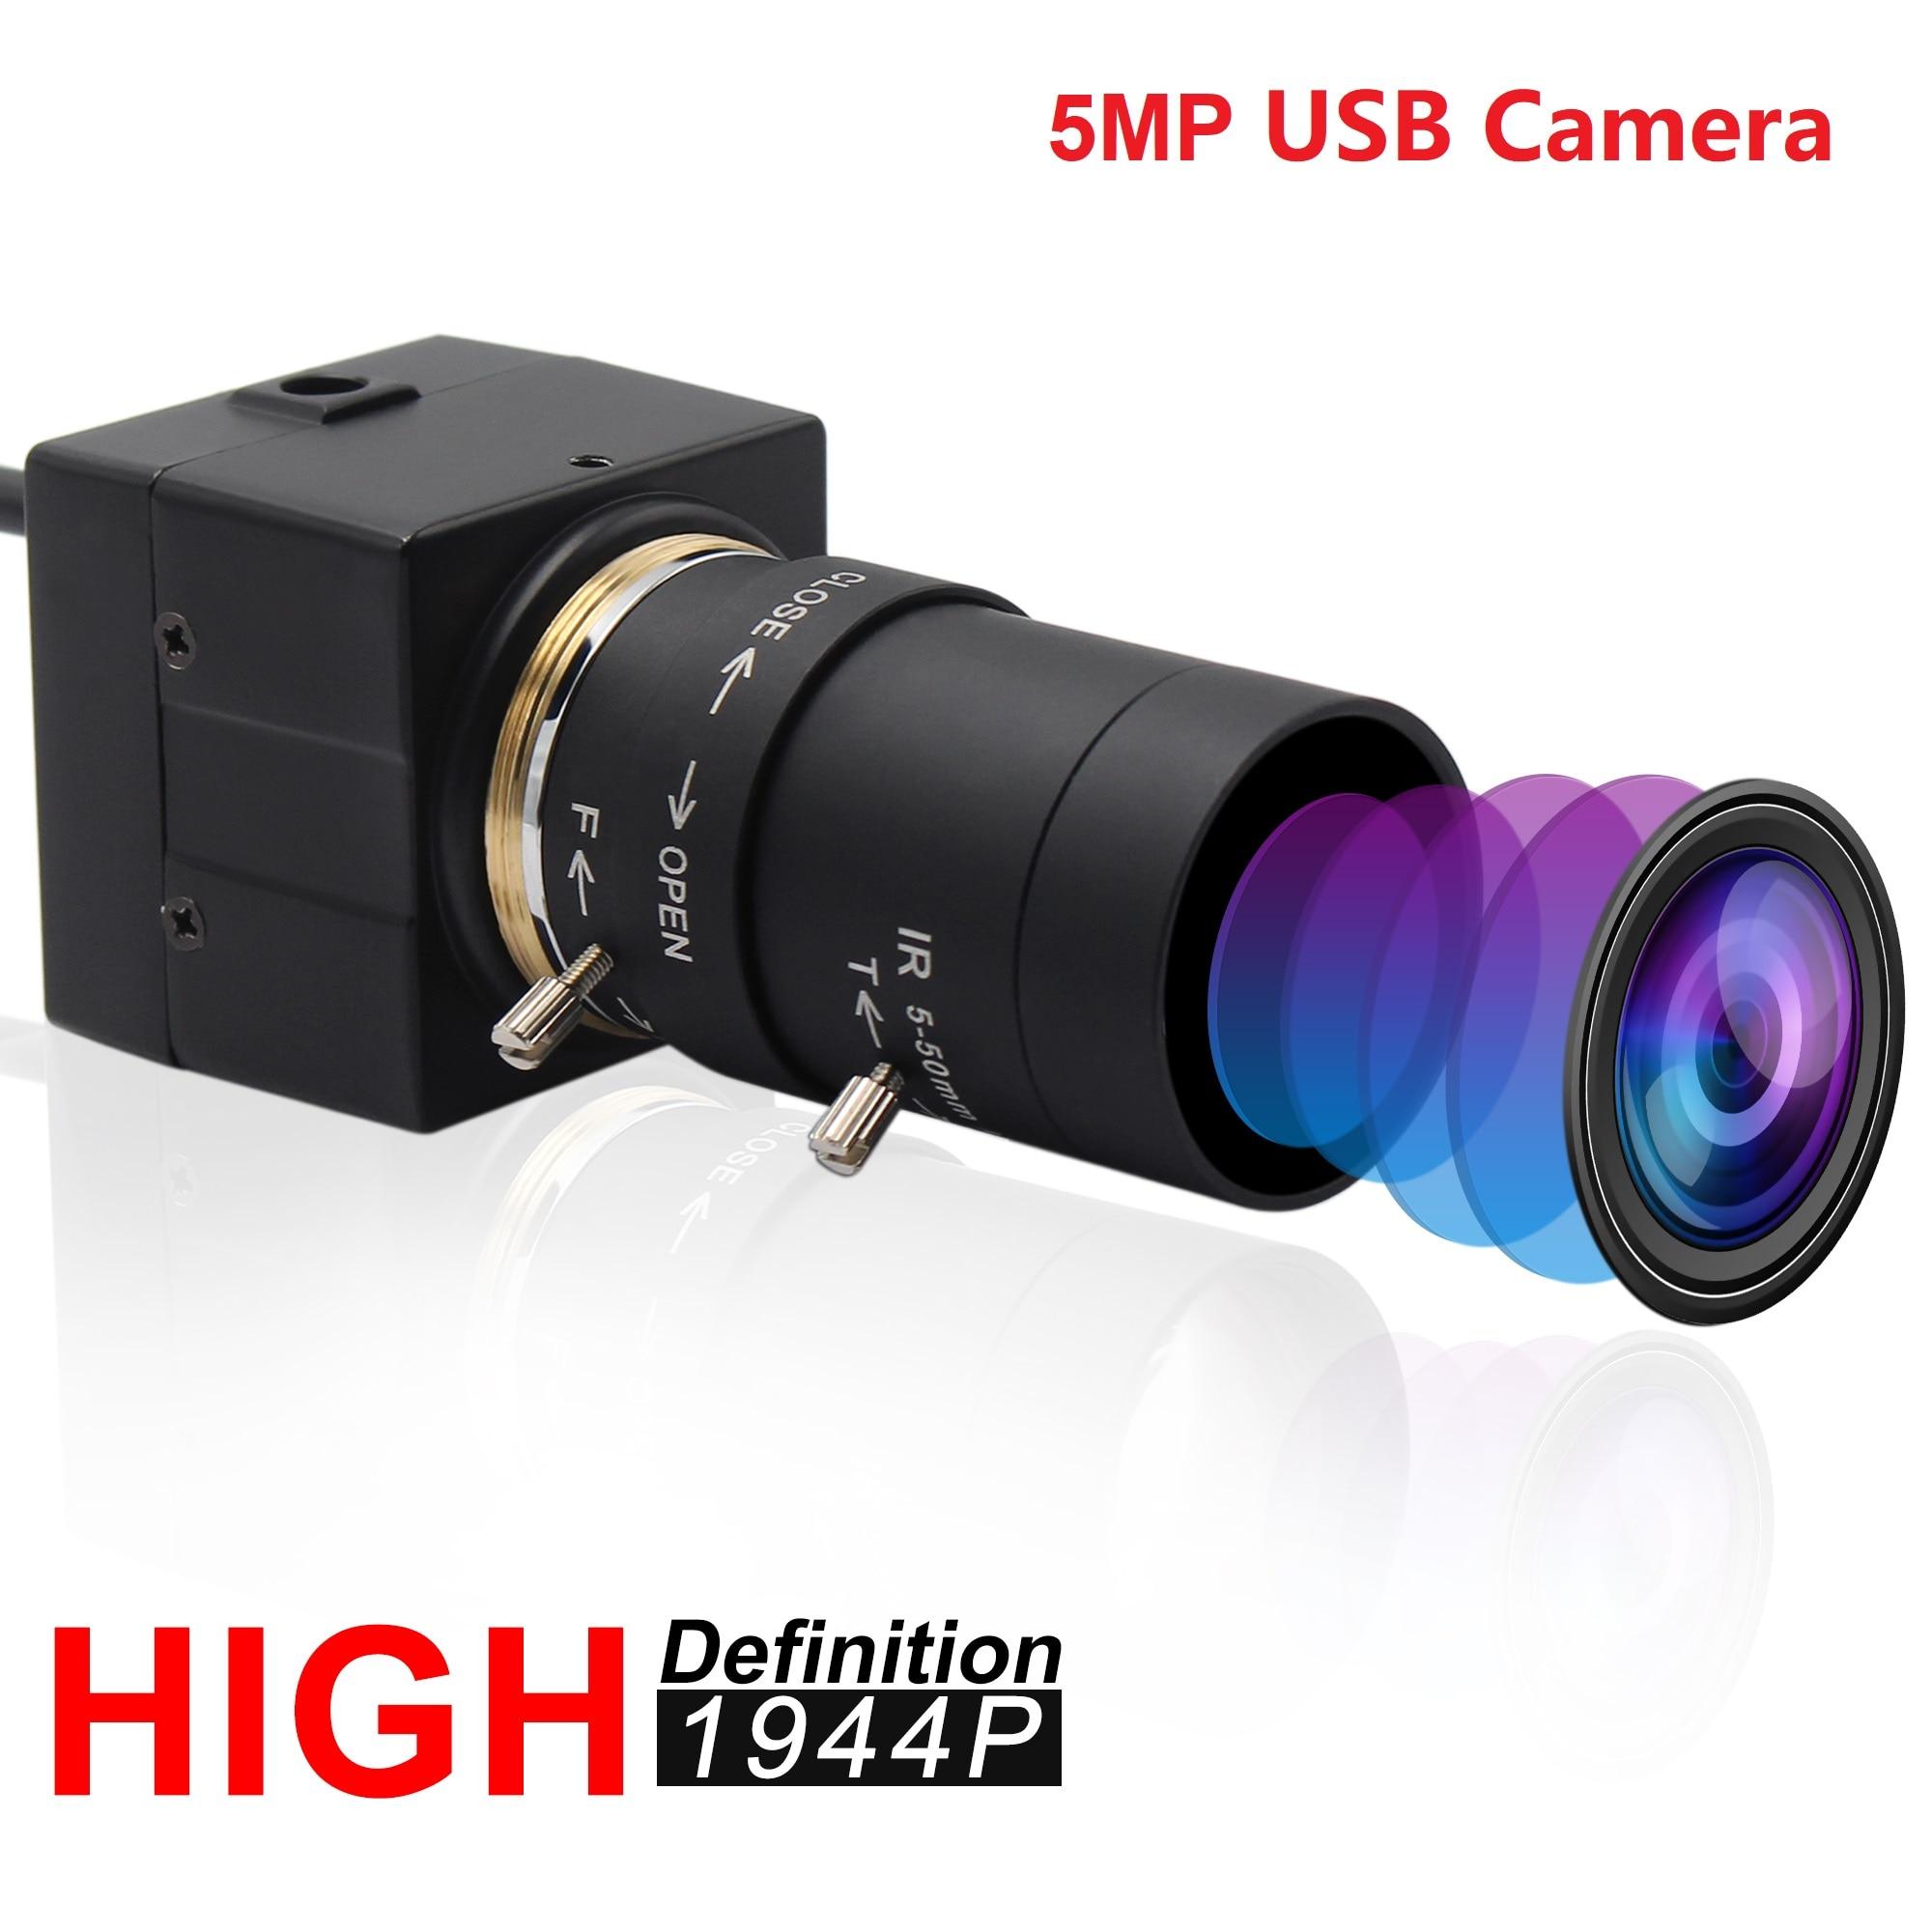 Камера високе резолуције УСБ 2.0 веб камере Аптина МИ5100 Цолор ЦМОС Фулл ХД 5МП УСБ камера Варифоцал за 3Д штампач